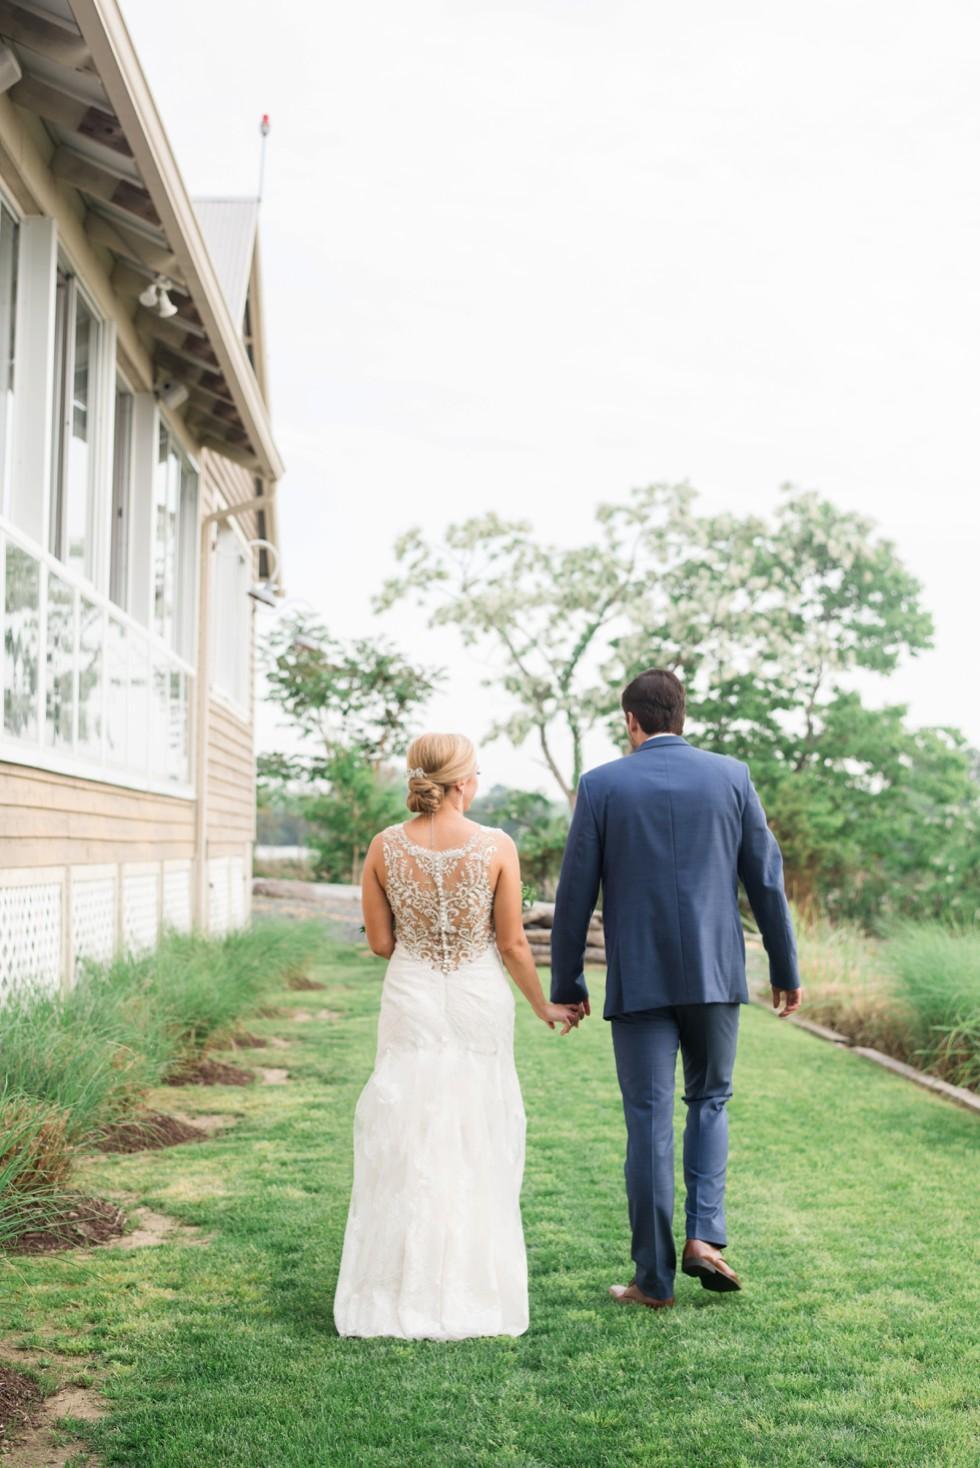 Chesapeake Bay beach bride and groom